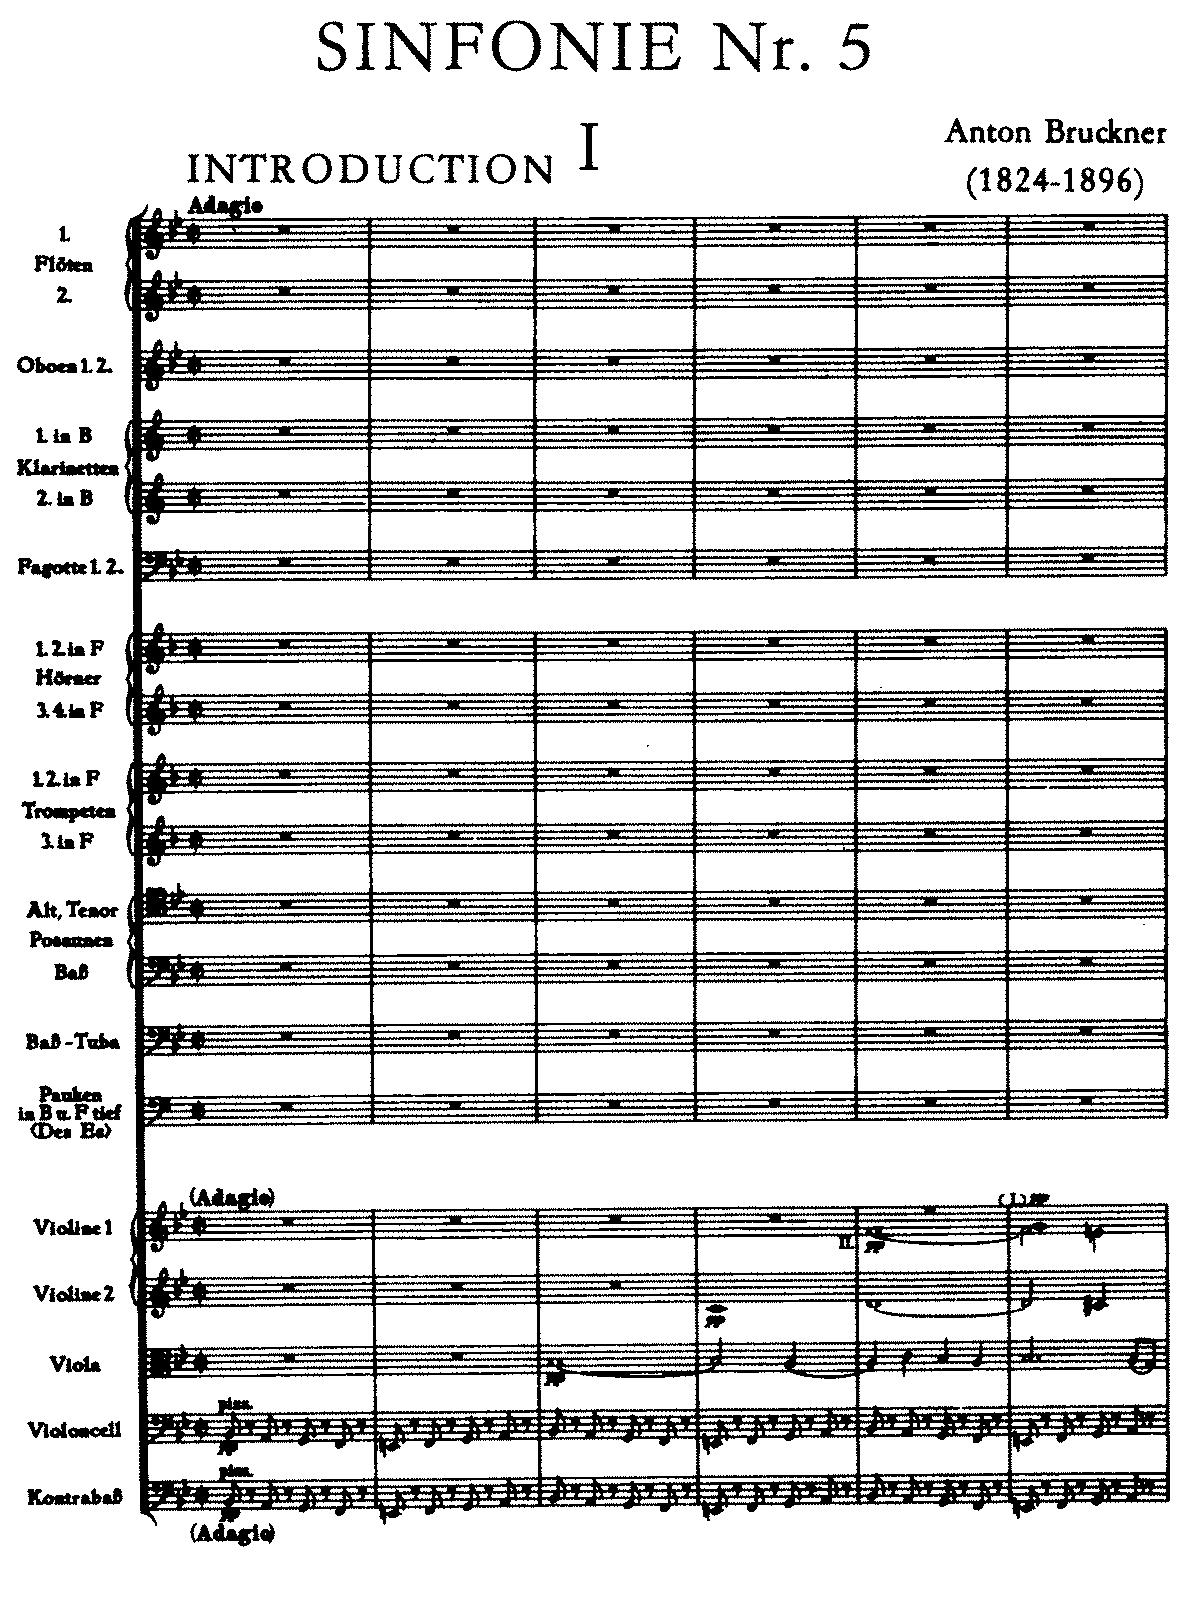 Symphony No.5 in B-flat major, WAB 105 (Bruckner, Anton) - IMSLP ...